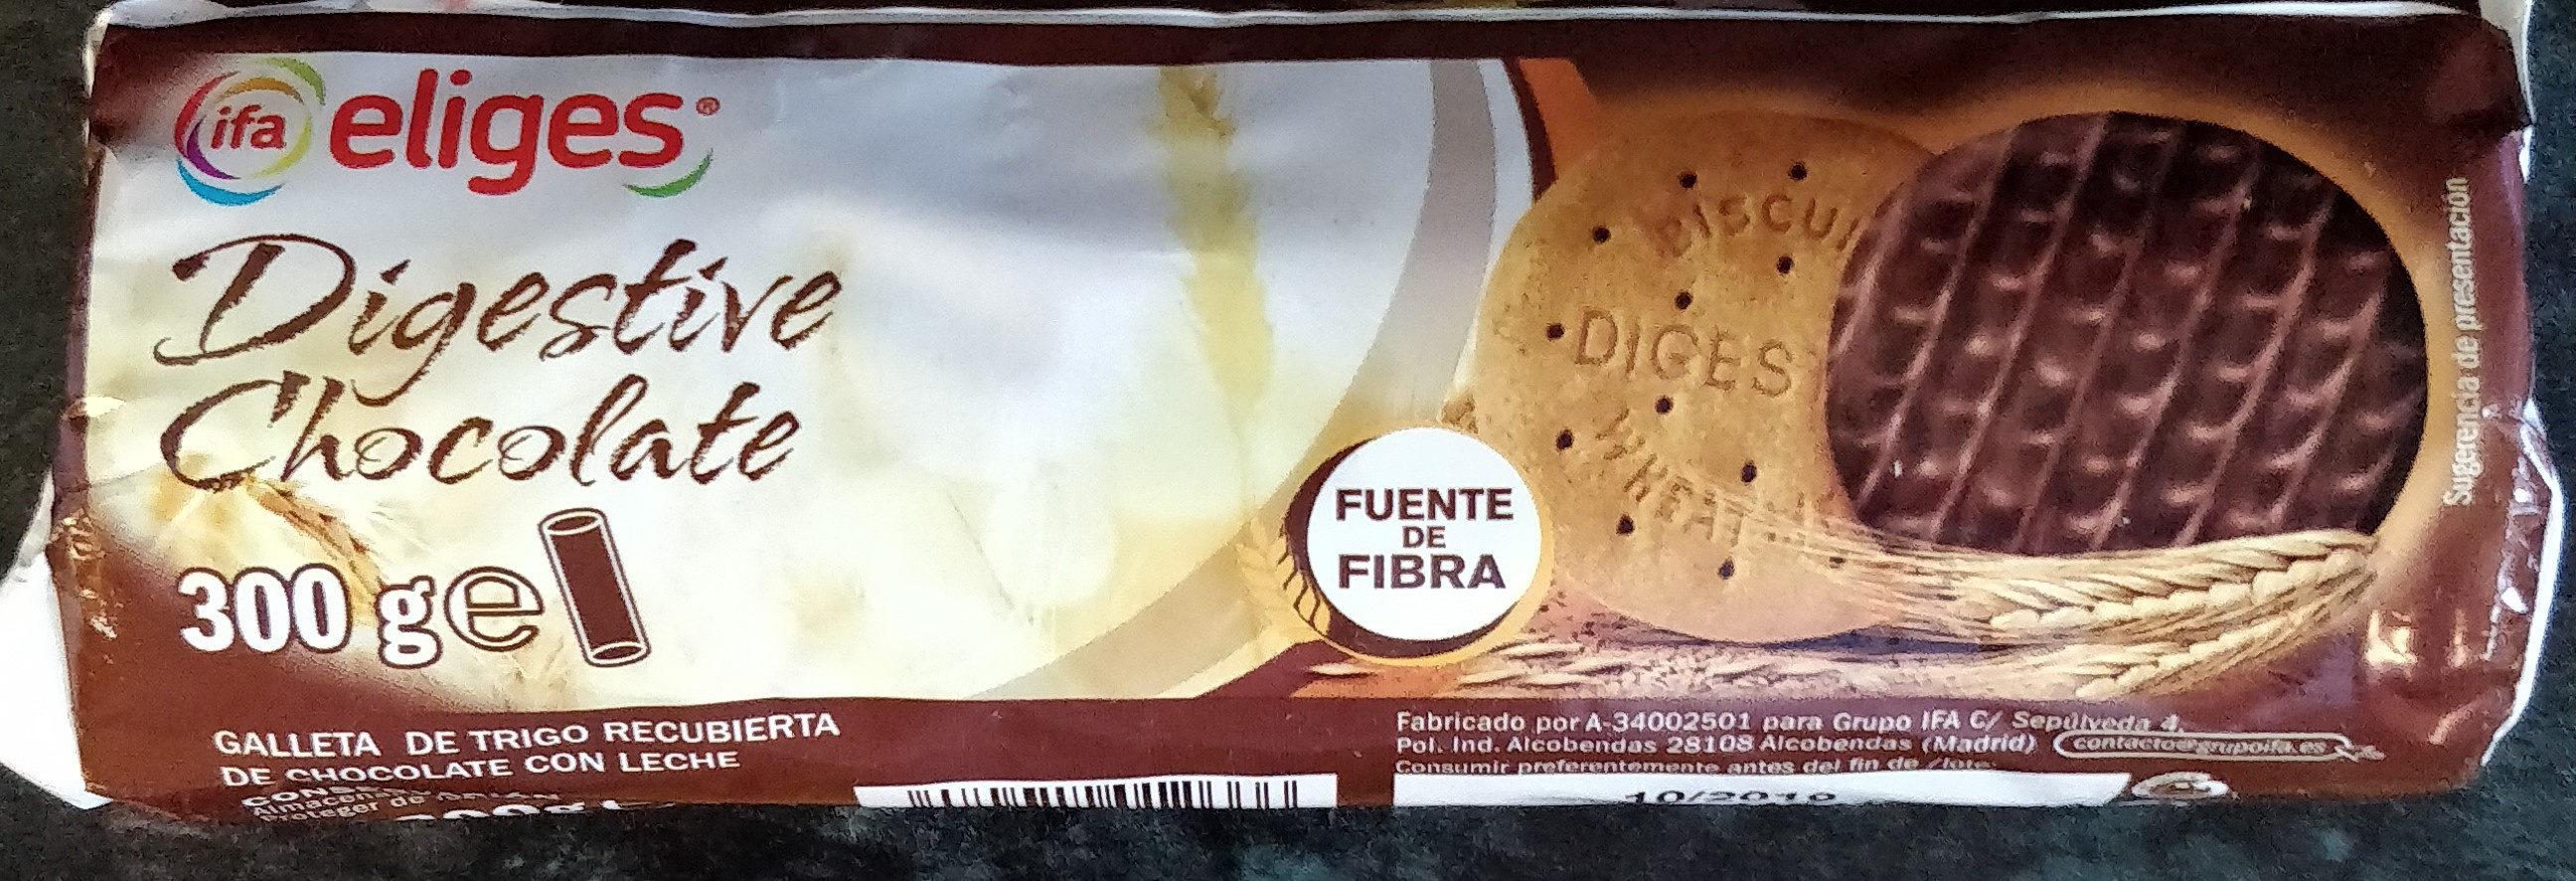 Galletas digestive - Producte - es